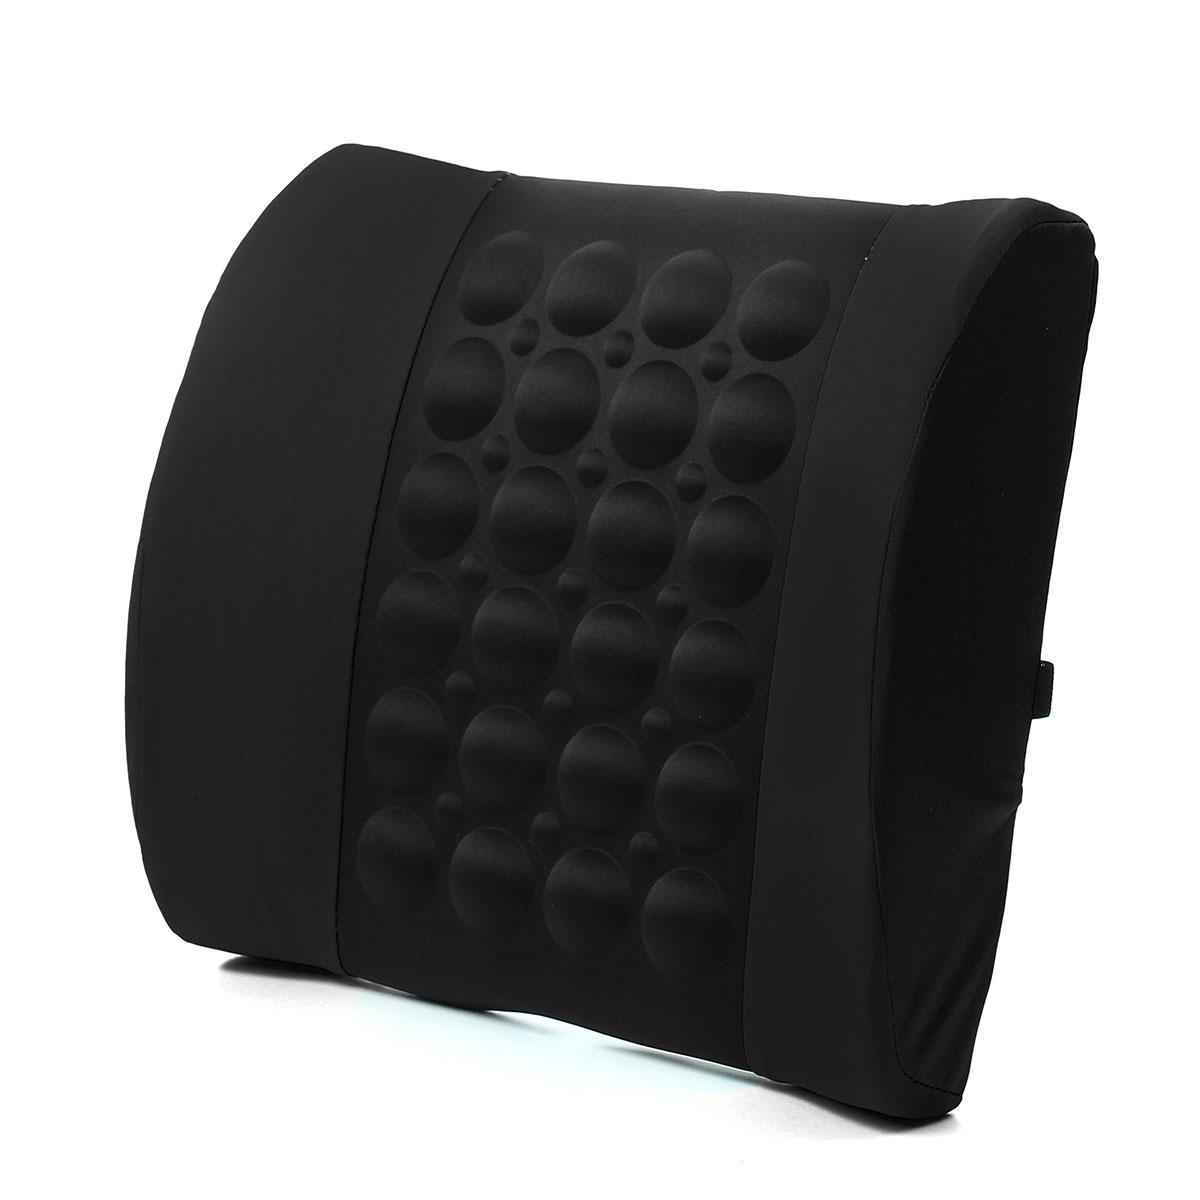 Black Multifunctional Electrical Car Massage Lumbar